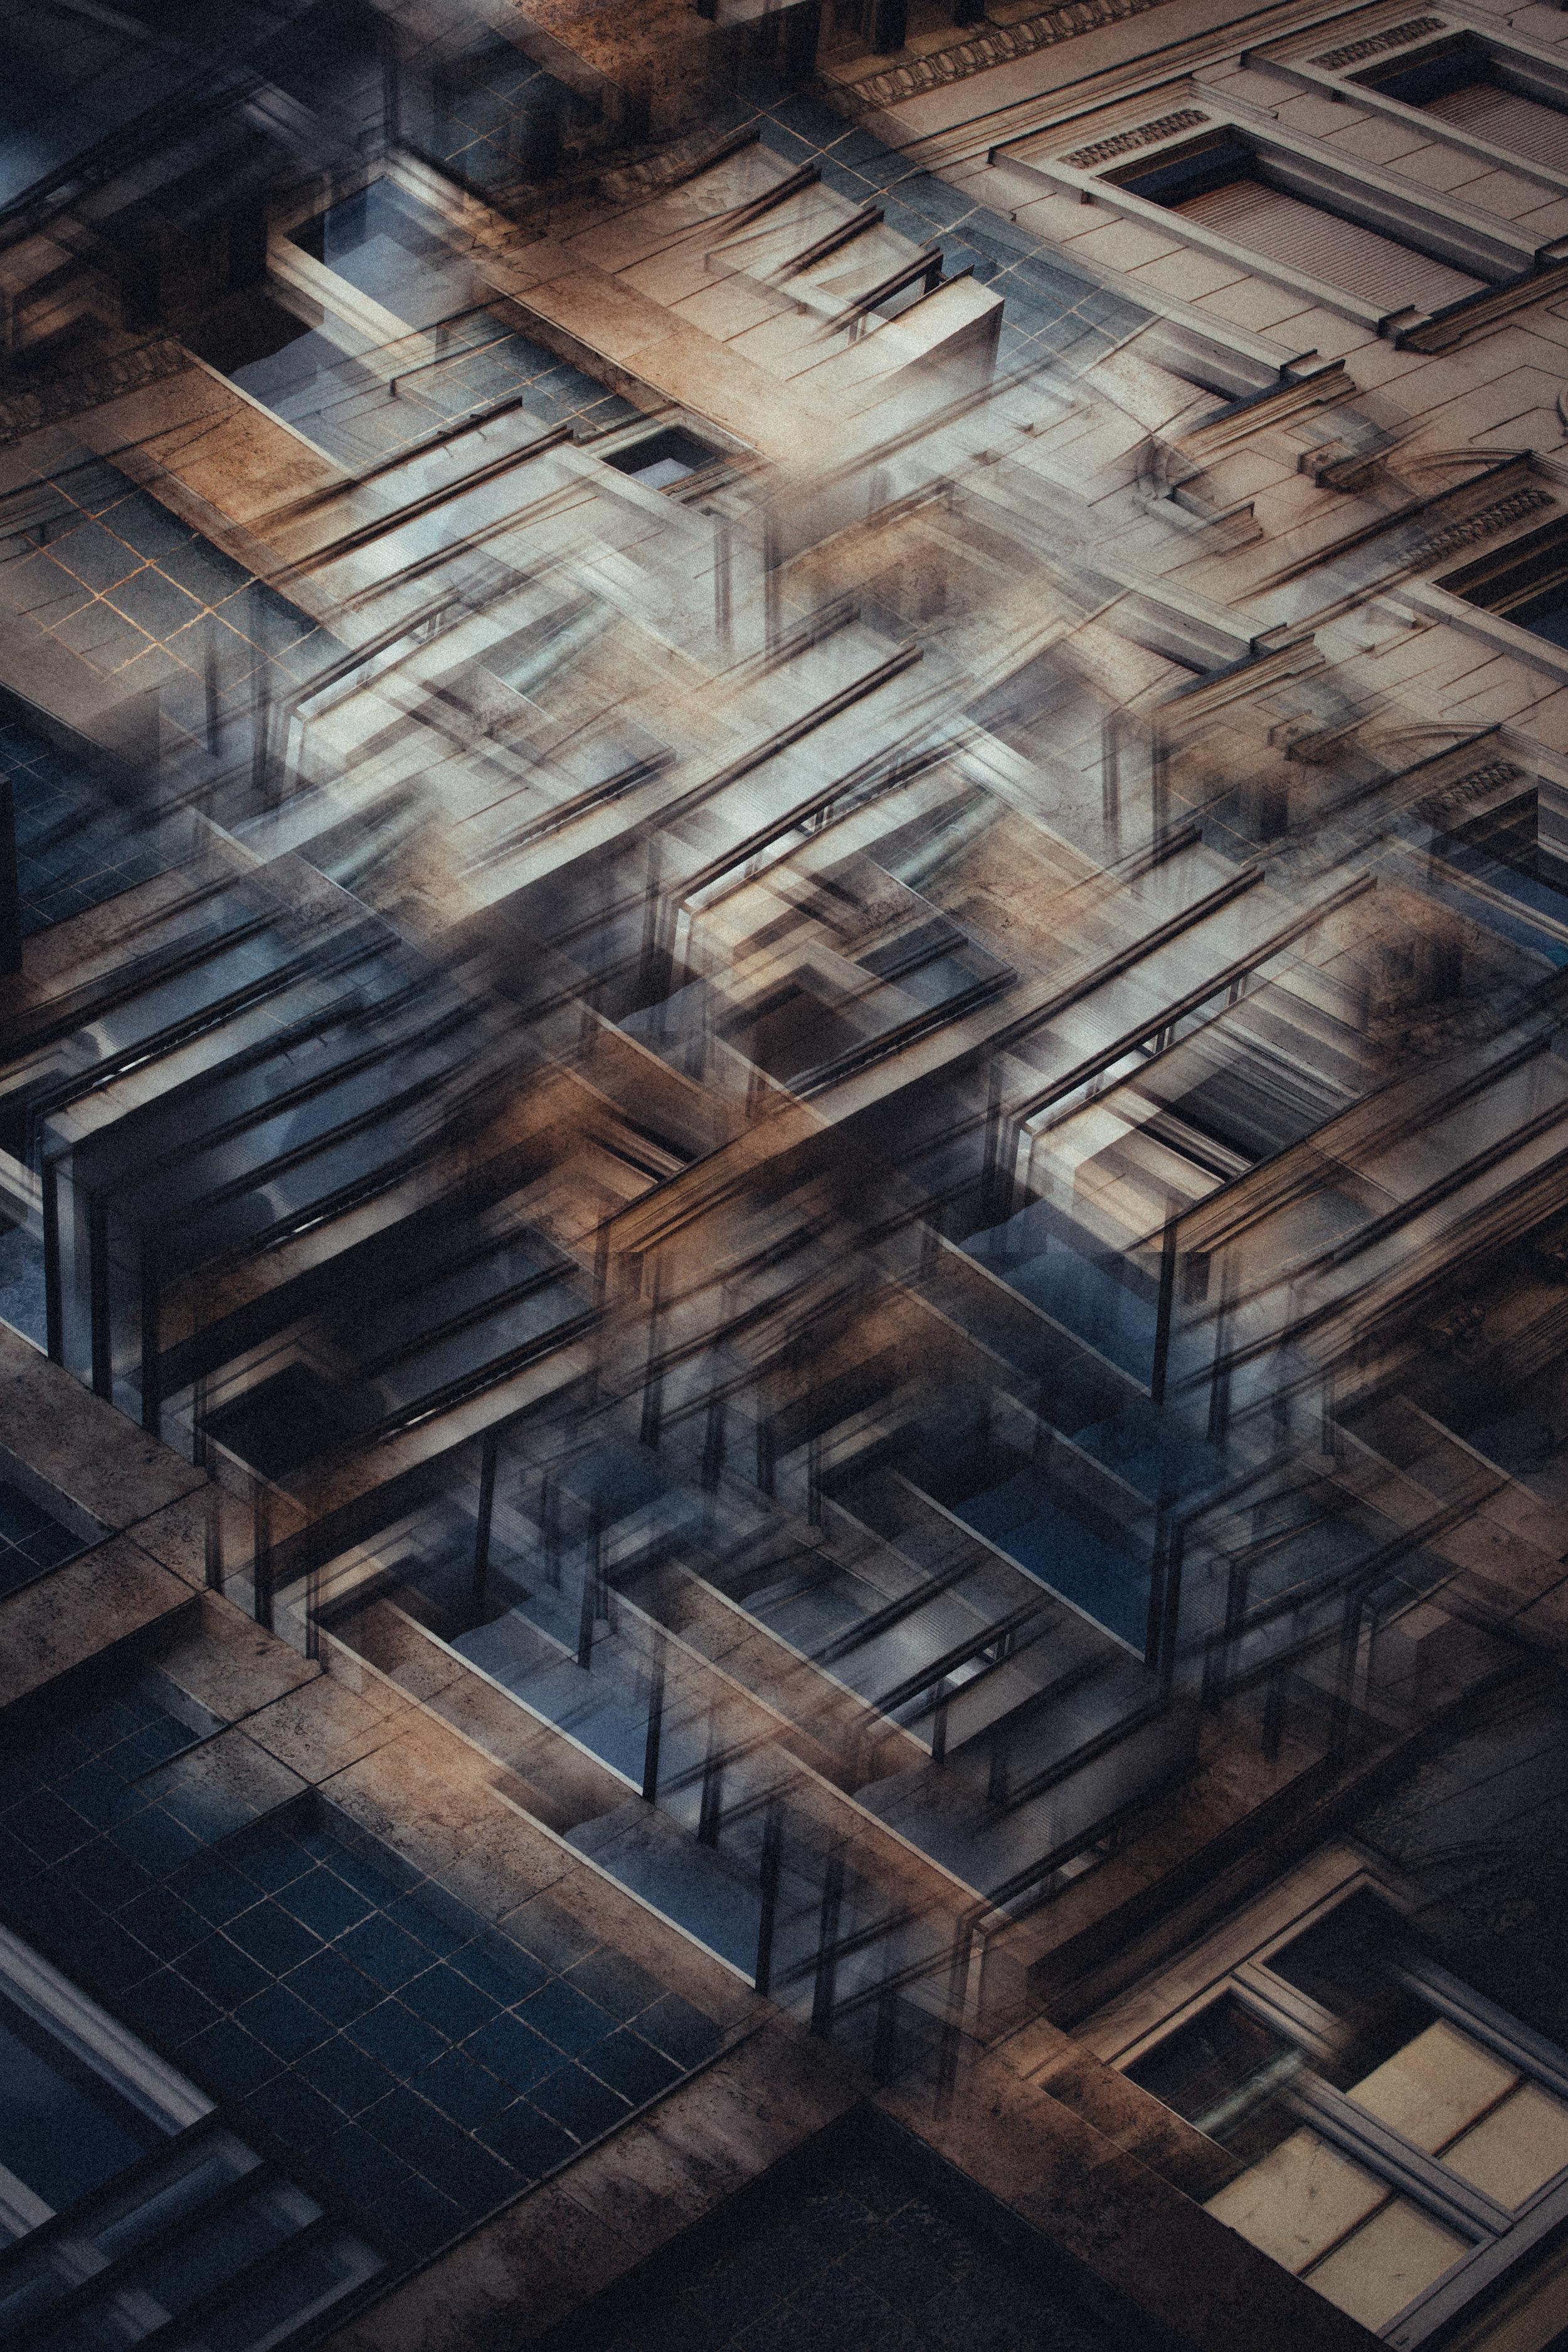 Budapest in Blocks